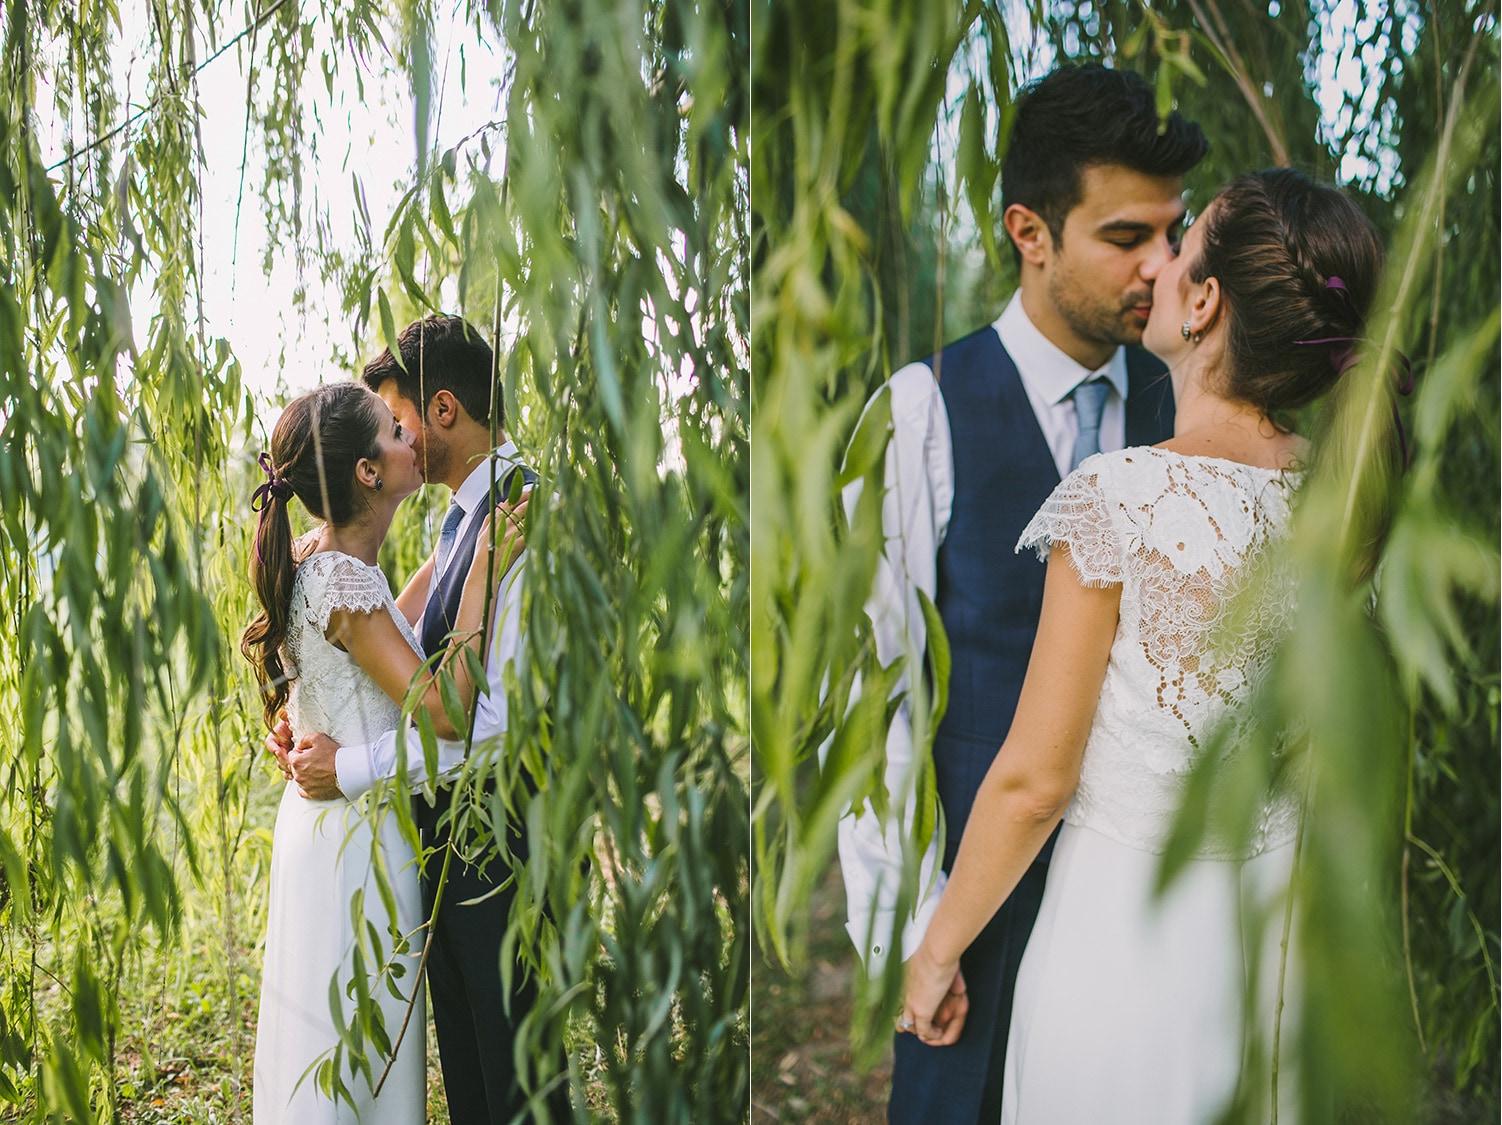 paulagfurio_tropical wedding_ 06.jpg